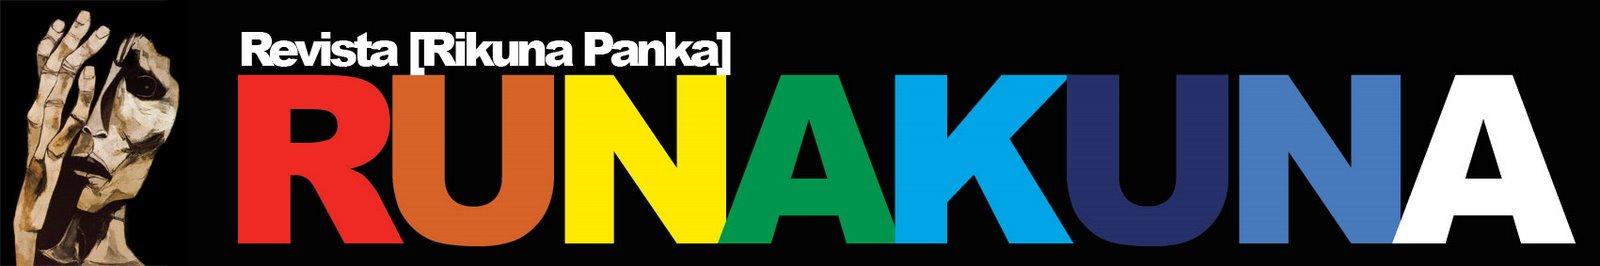 Revista Runakuna